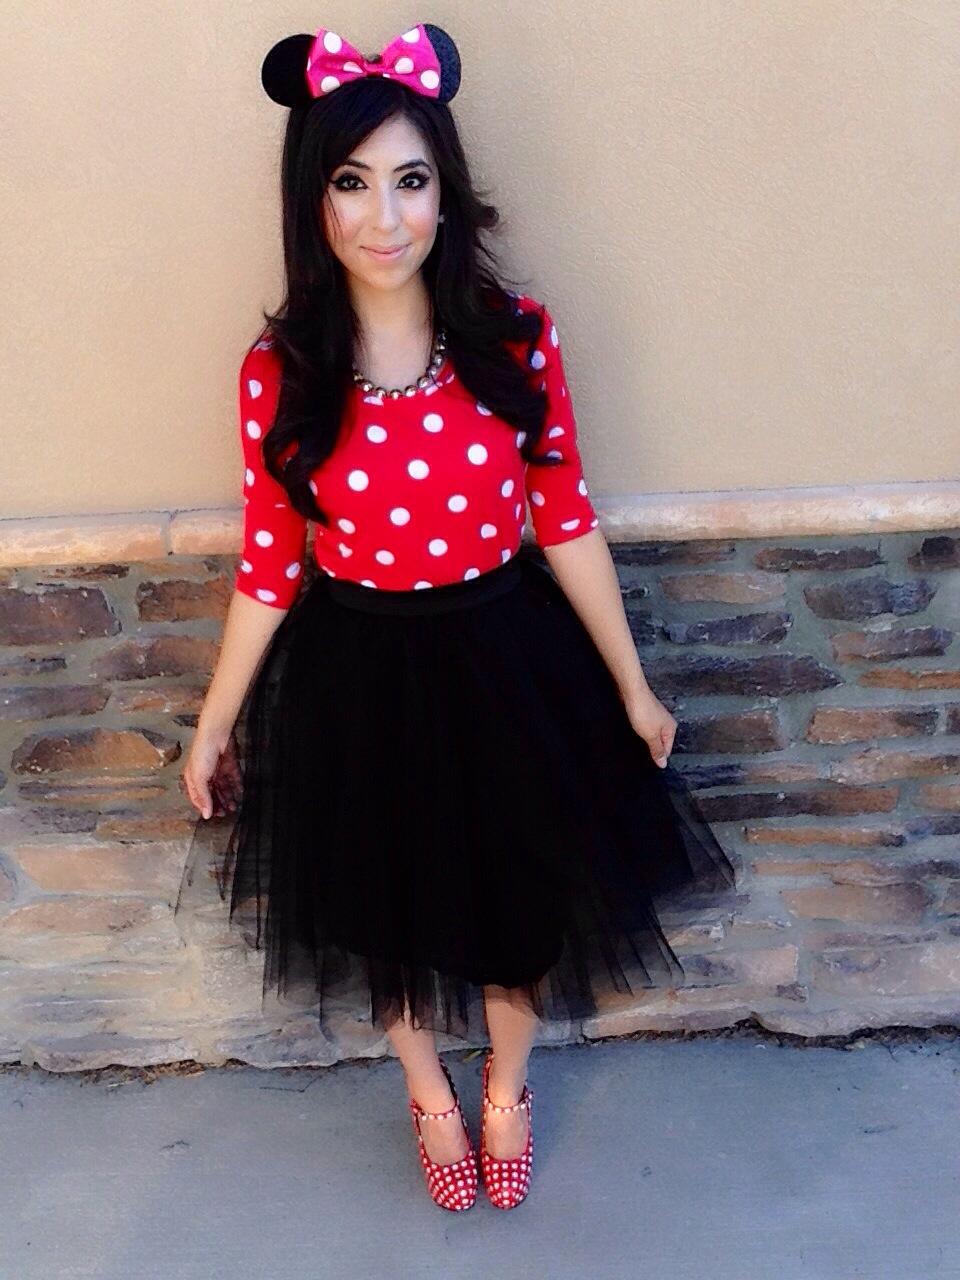 Polka Dot Dress Halloween Costume